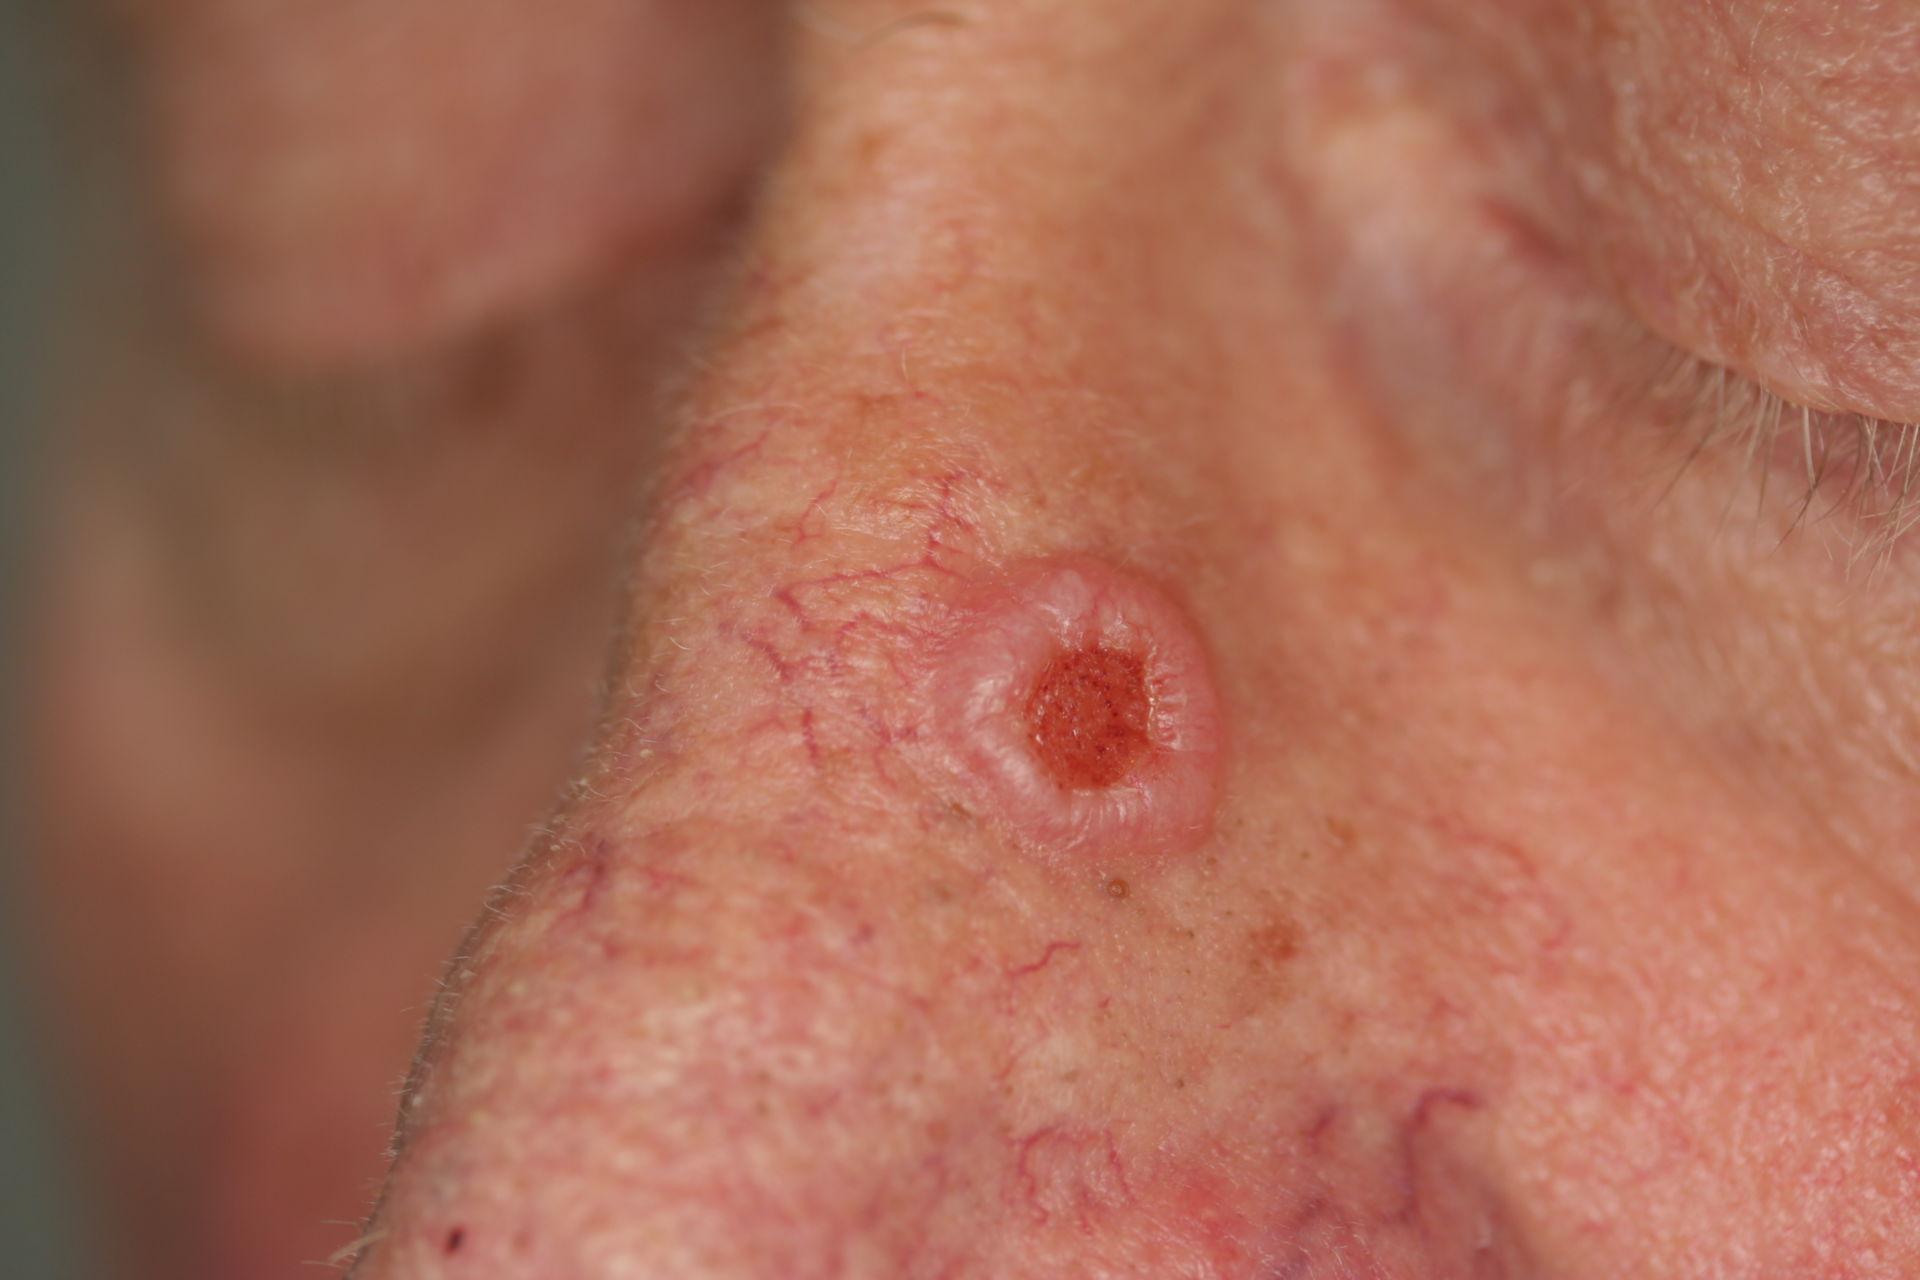 Carcinoma nodular basocelular